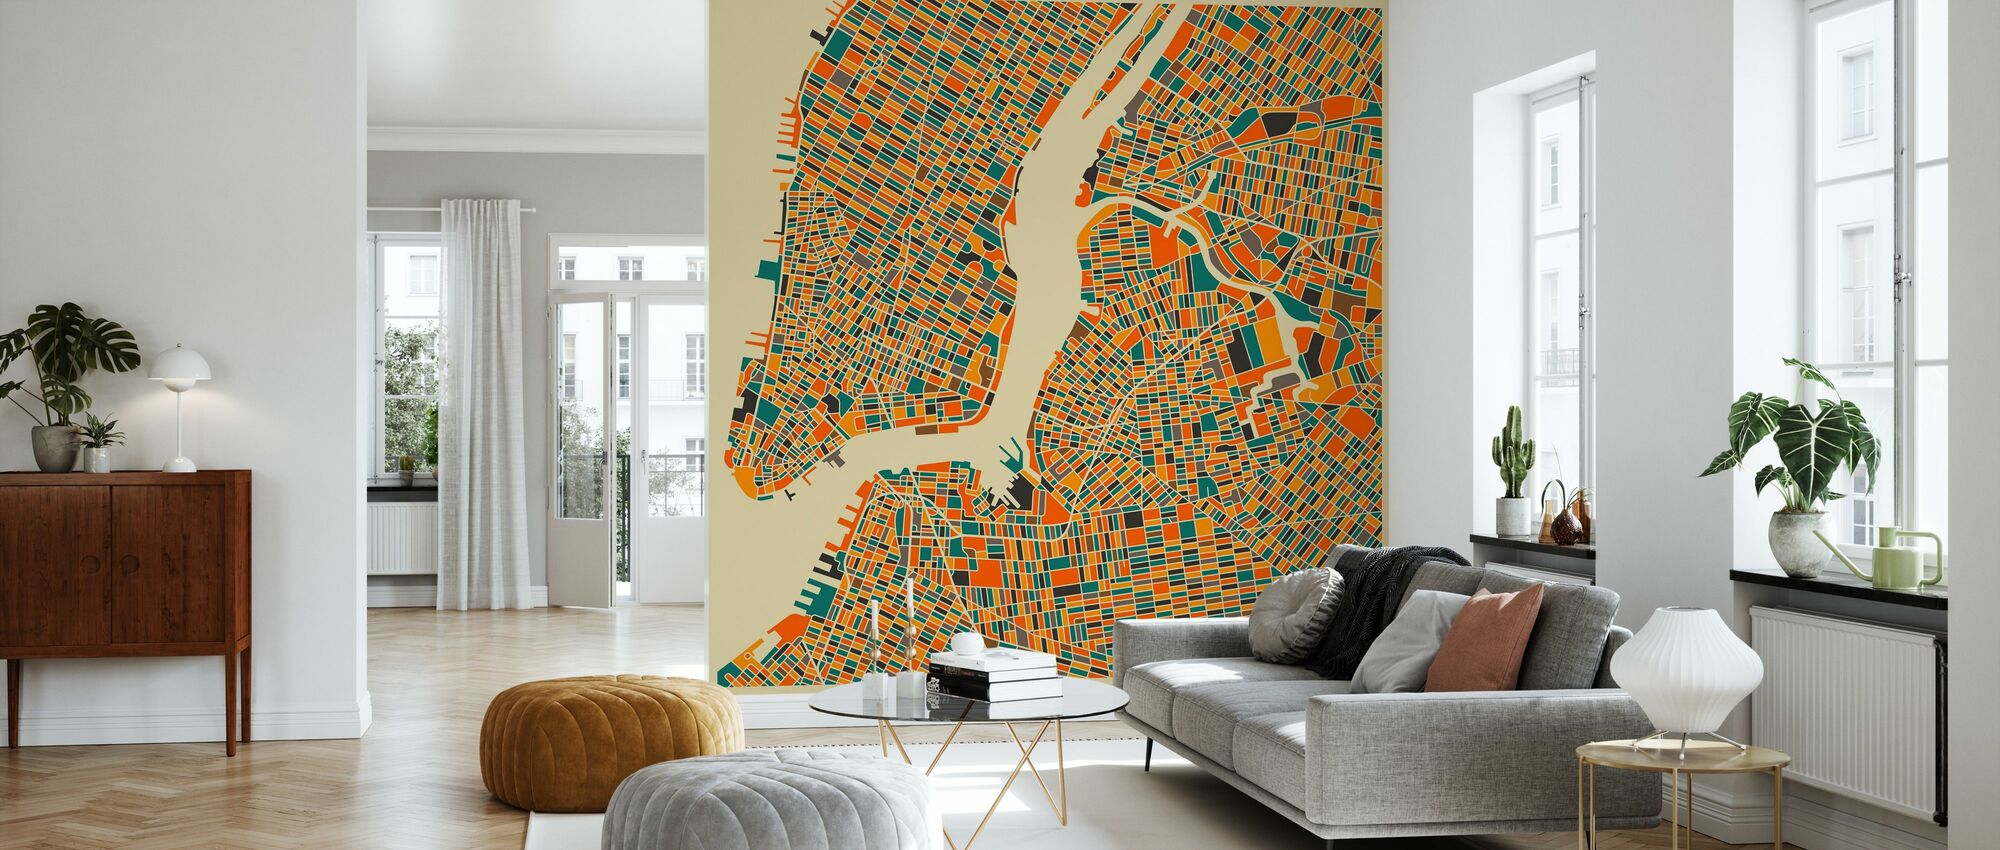 Multicolor Map - New York - Wallpaper - Living Room